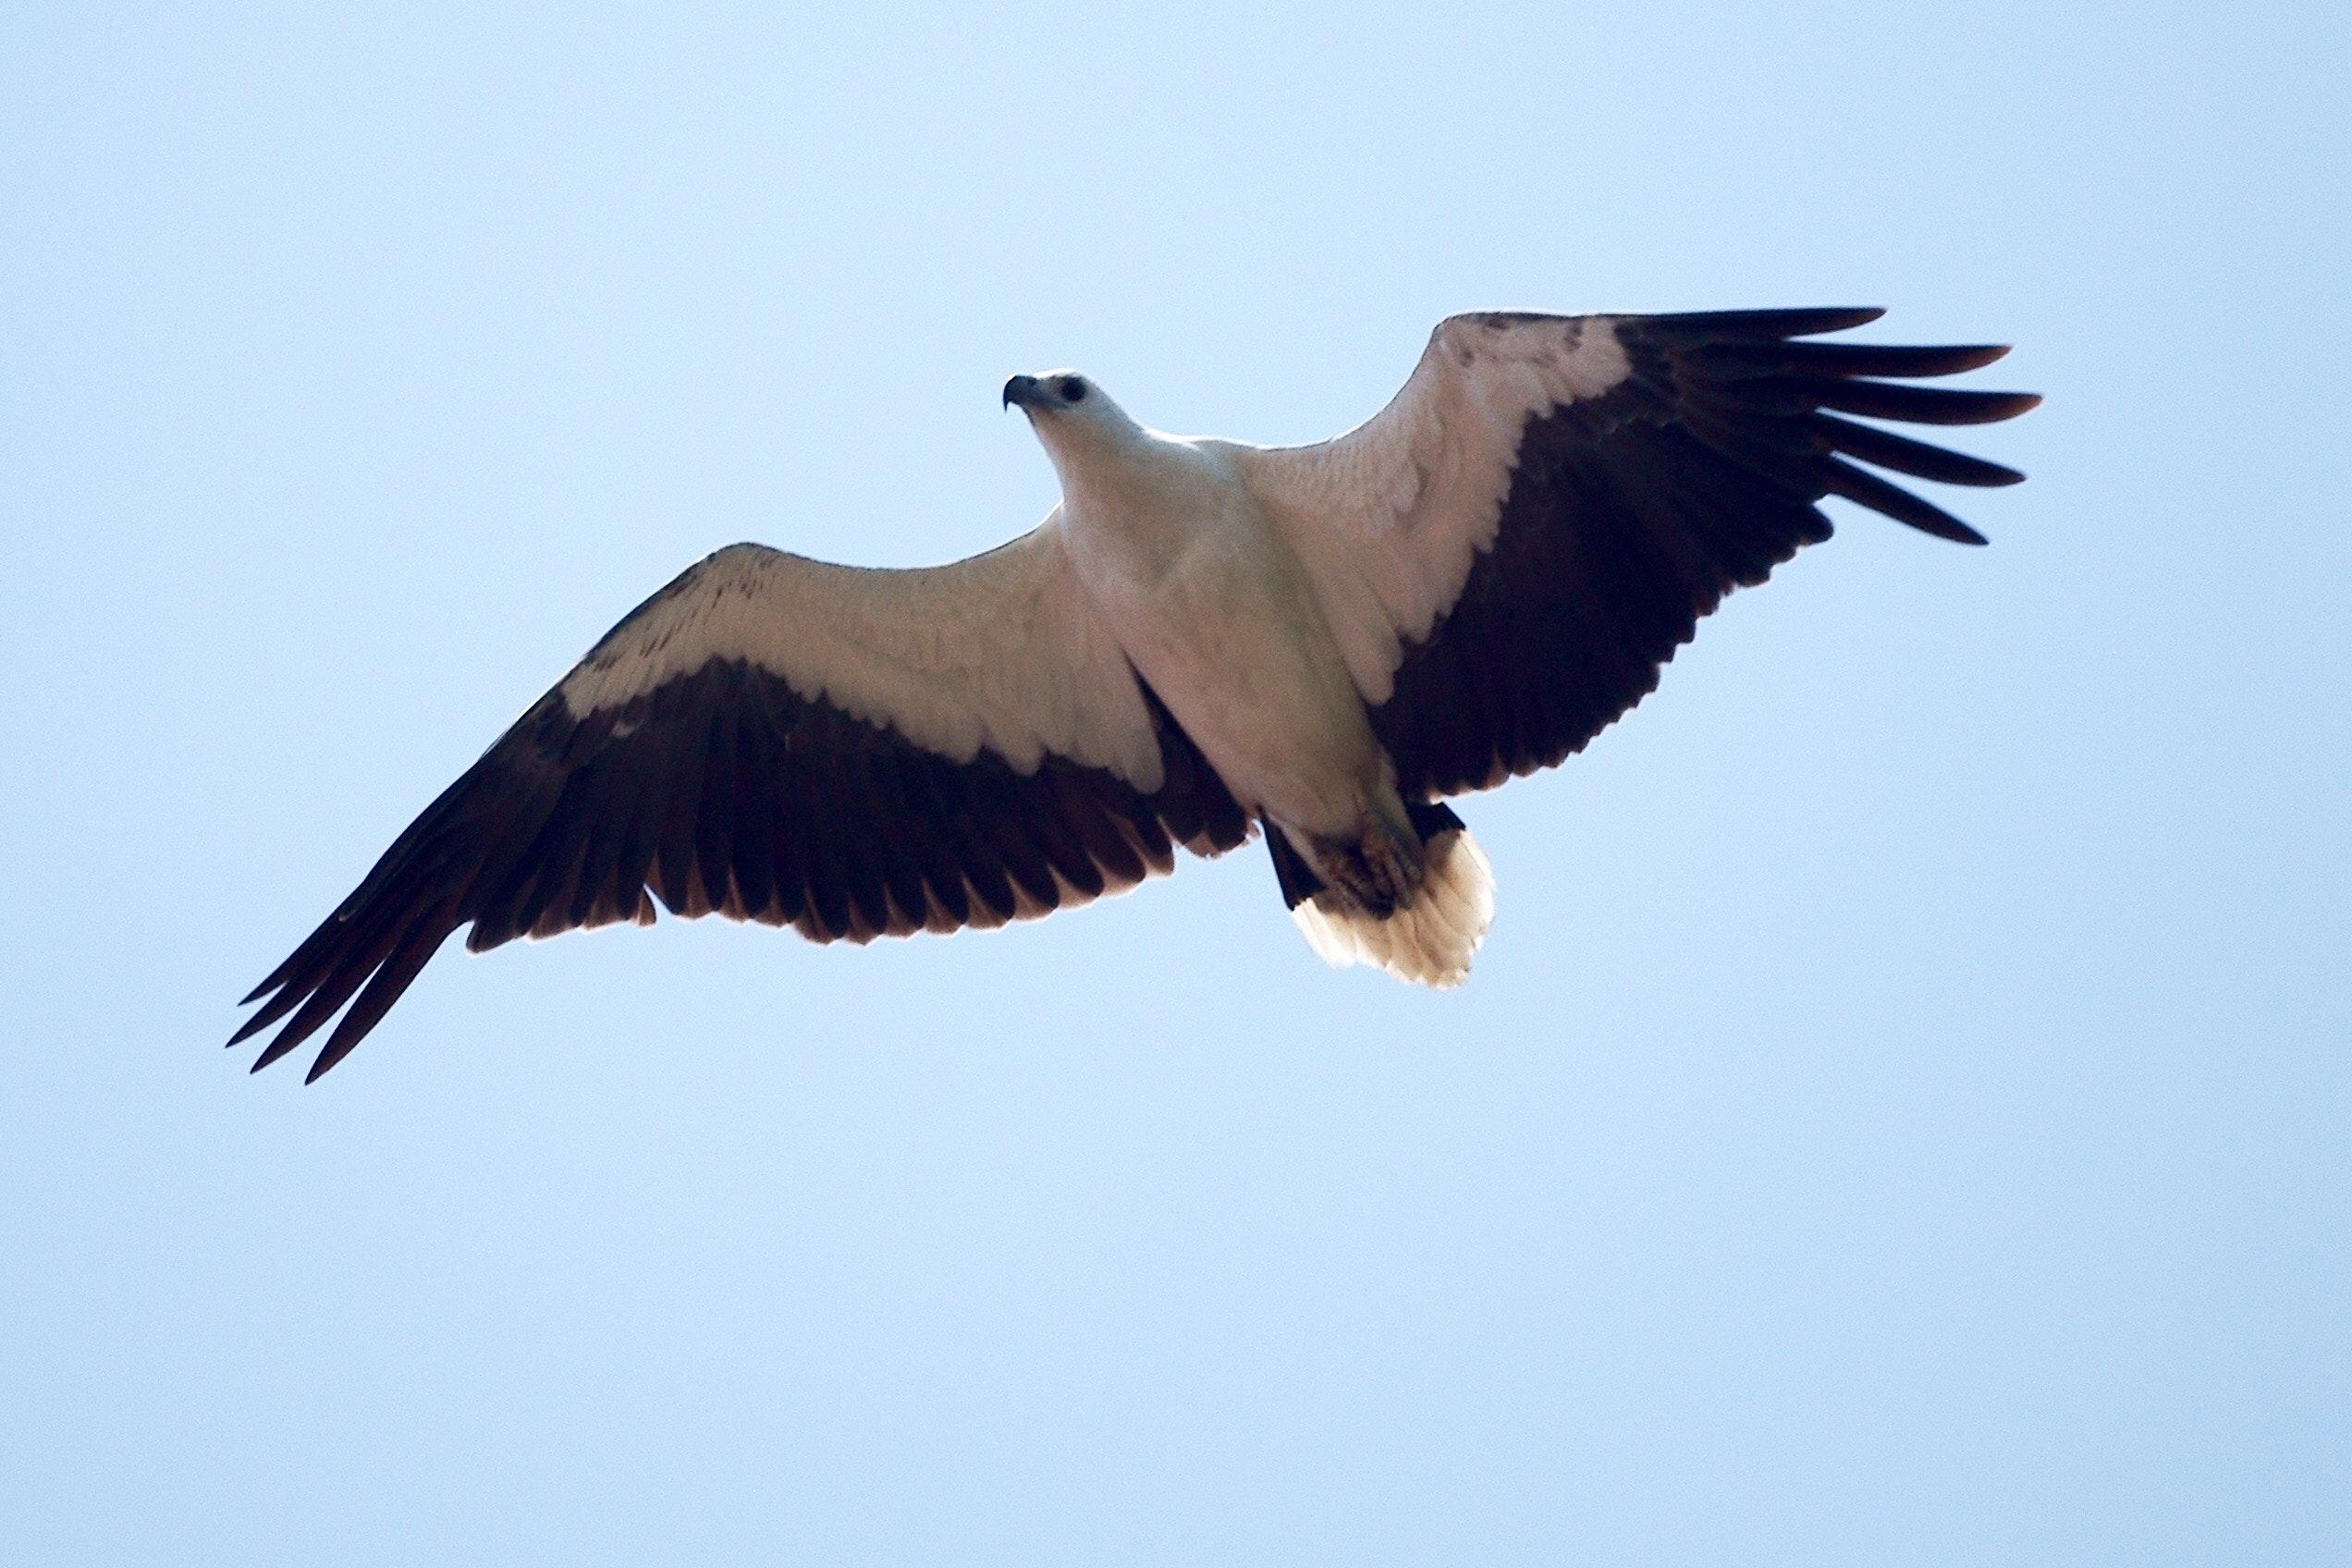 Download 770+  Gambar Burung Elang Laut HD  Free